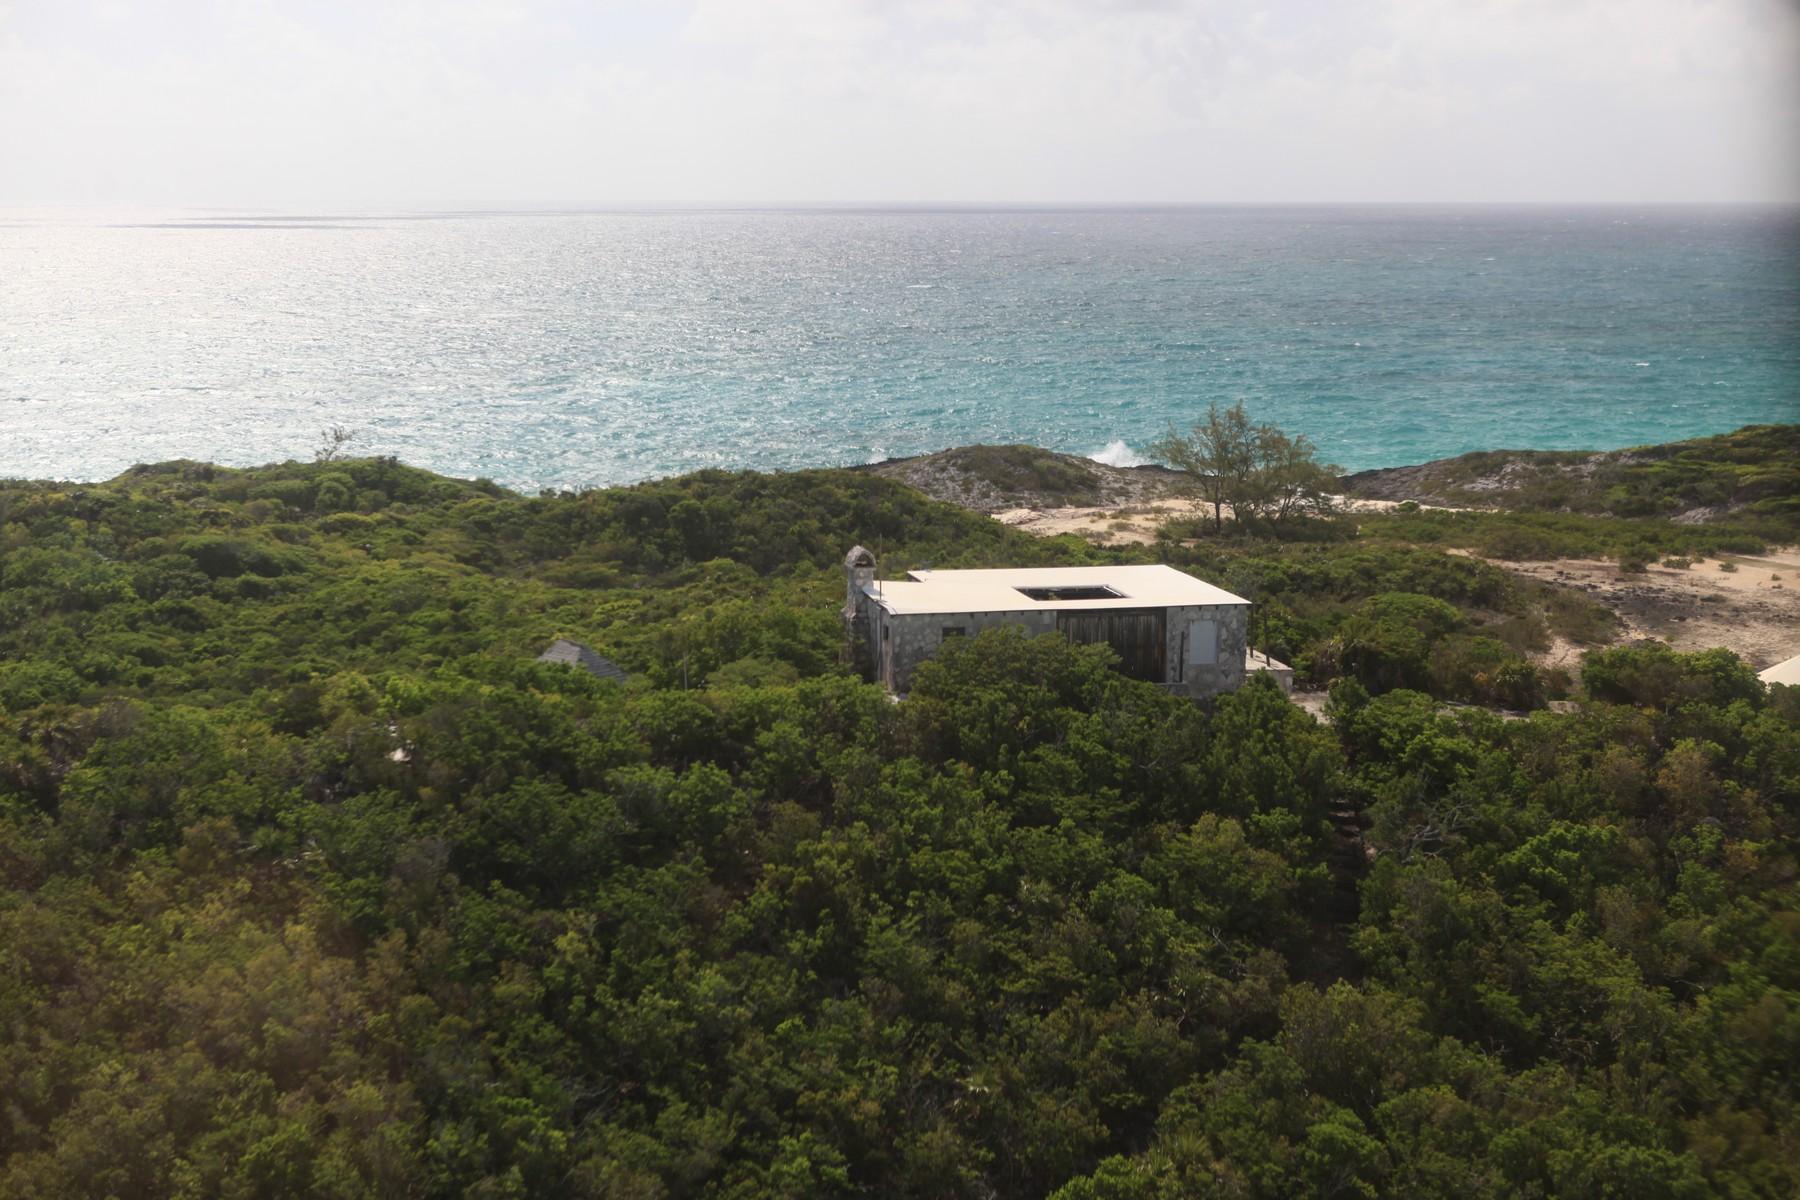 Additional photo for property listing at Saddleback Cay 埃克苏马群岛, 伊克苏马海 巴哈马